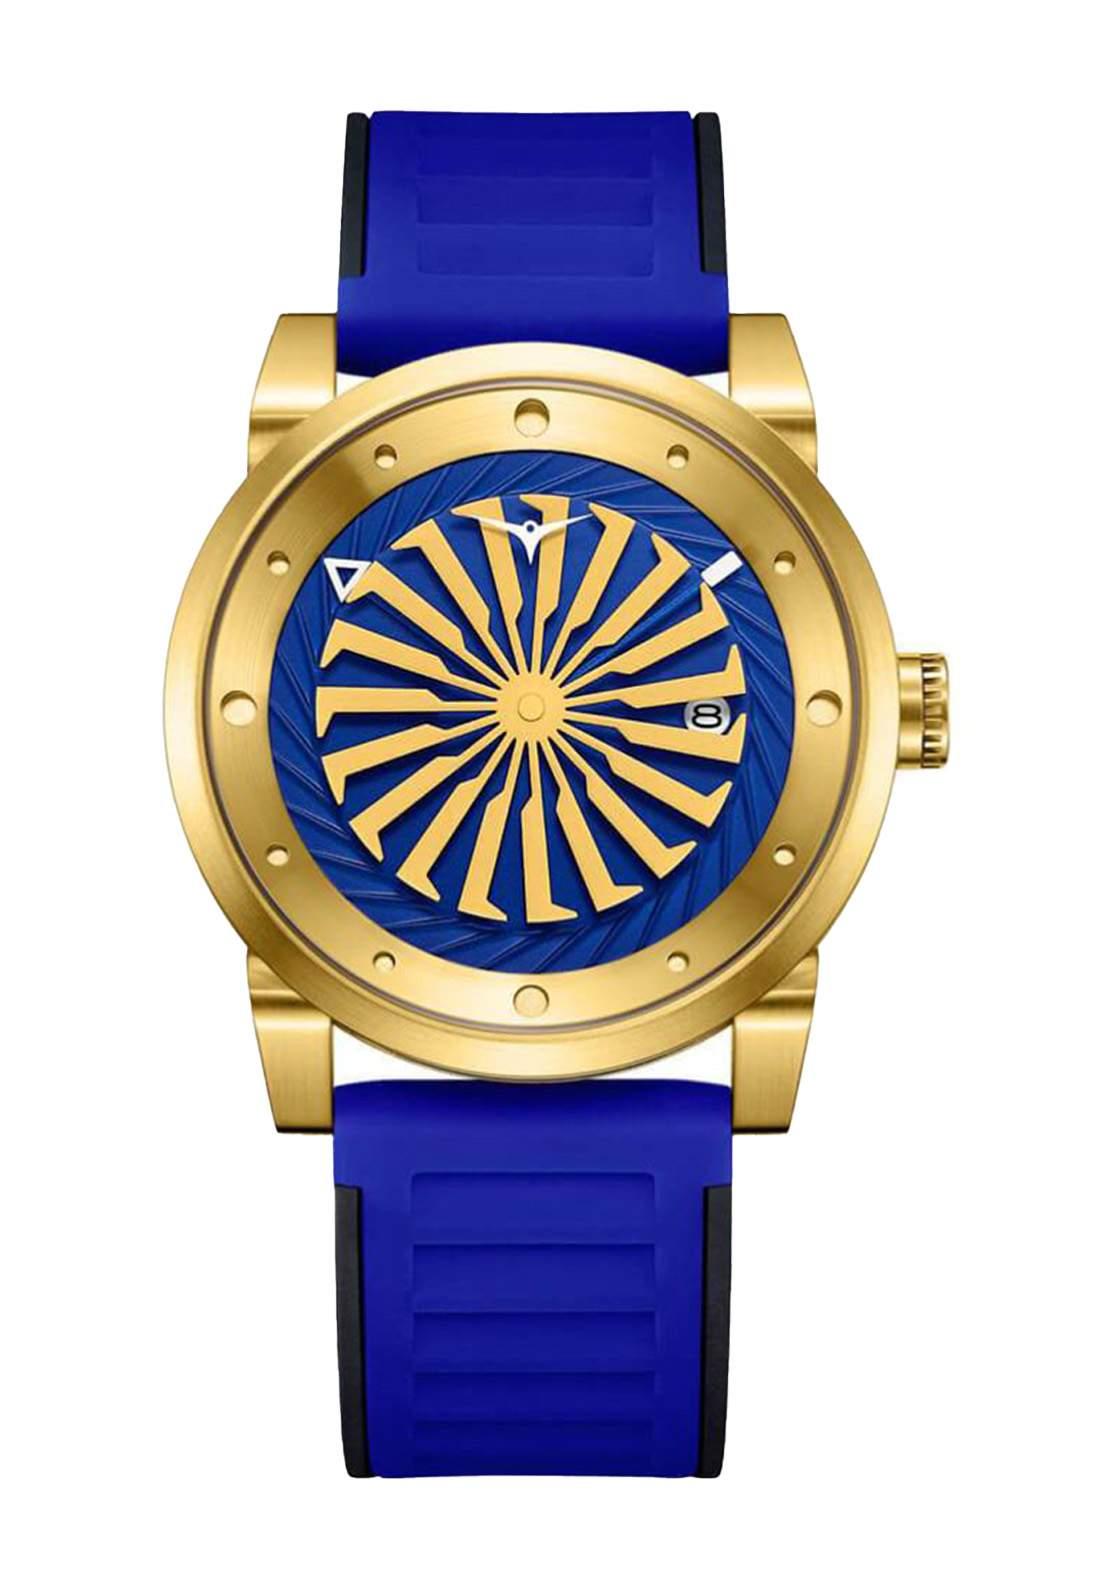 Zinvo Rival Volt Watch For Men - Blue ساعة رجالي